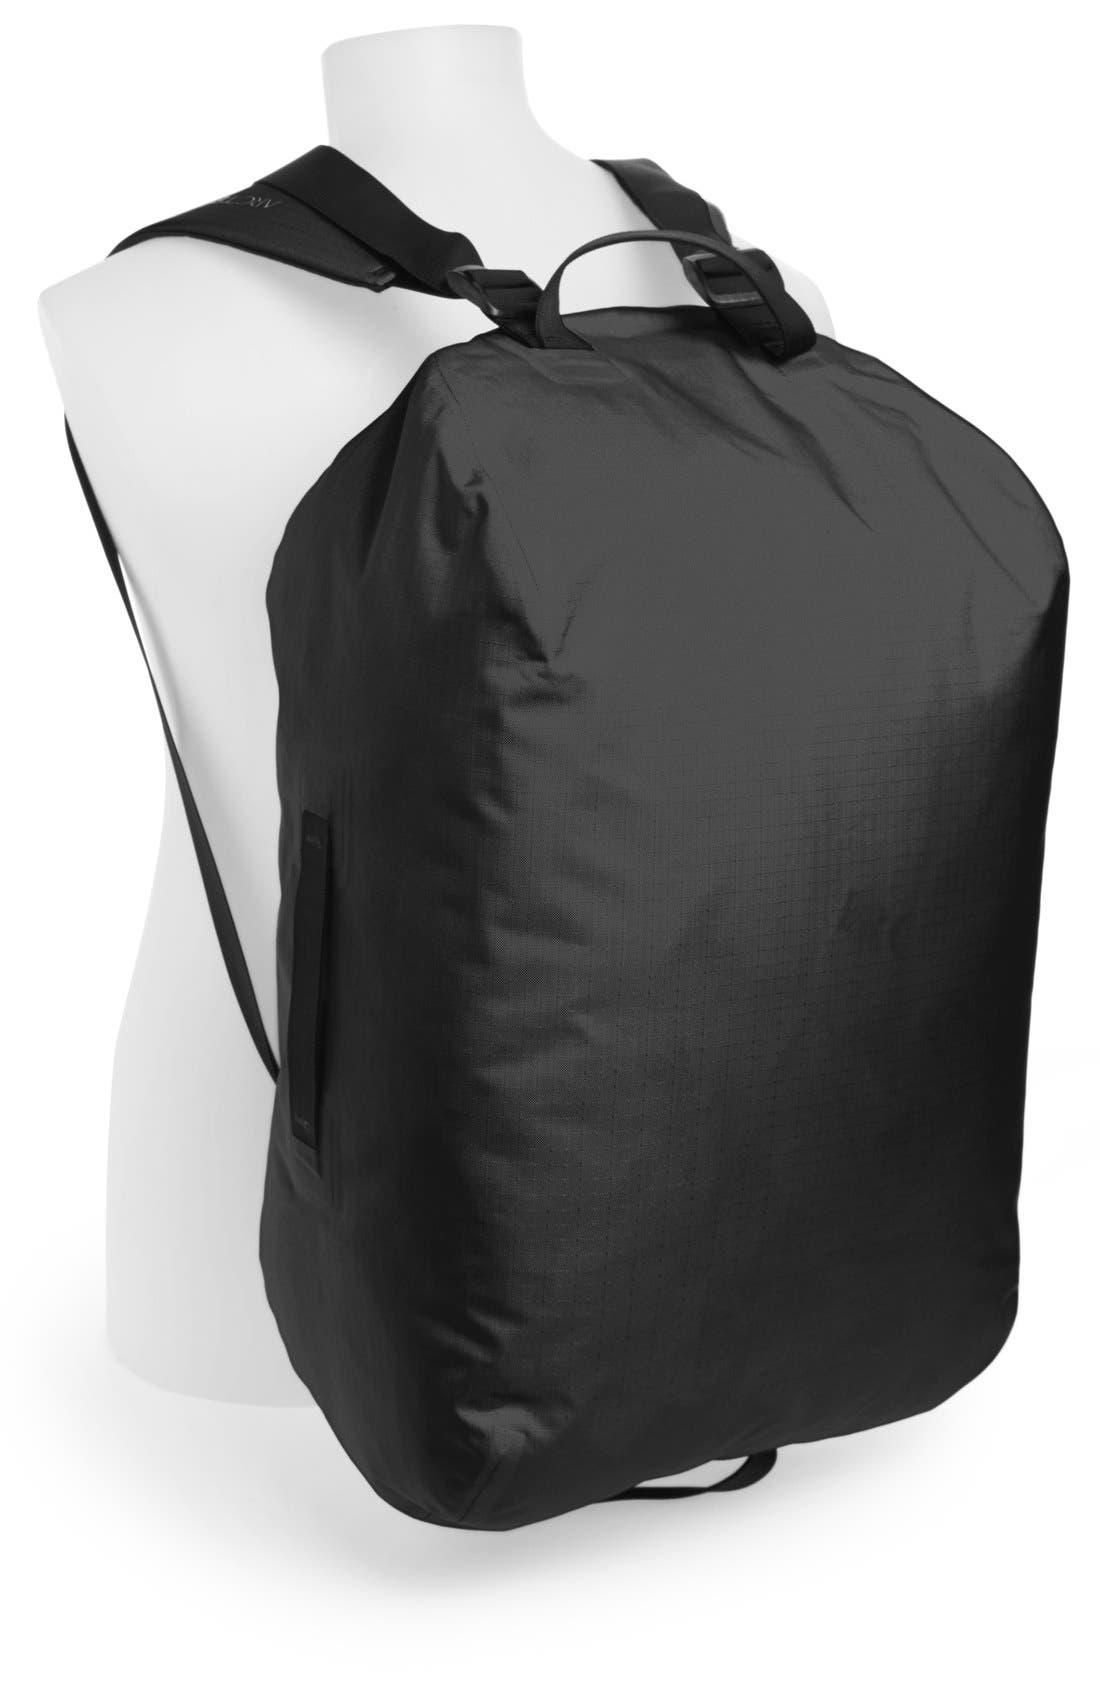 Alternate Image 2  - Arc'teryx 'Carrier' Weather Resistant Convertible Duffel Bag/Backpack (50 liter)